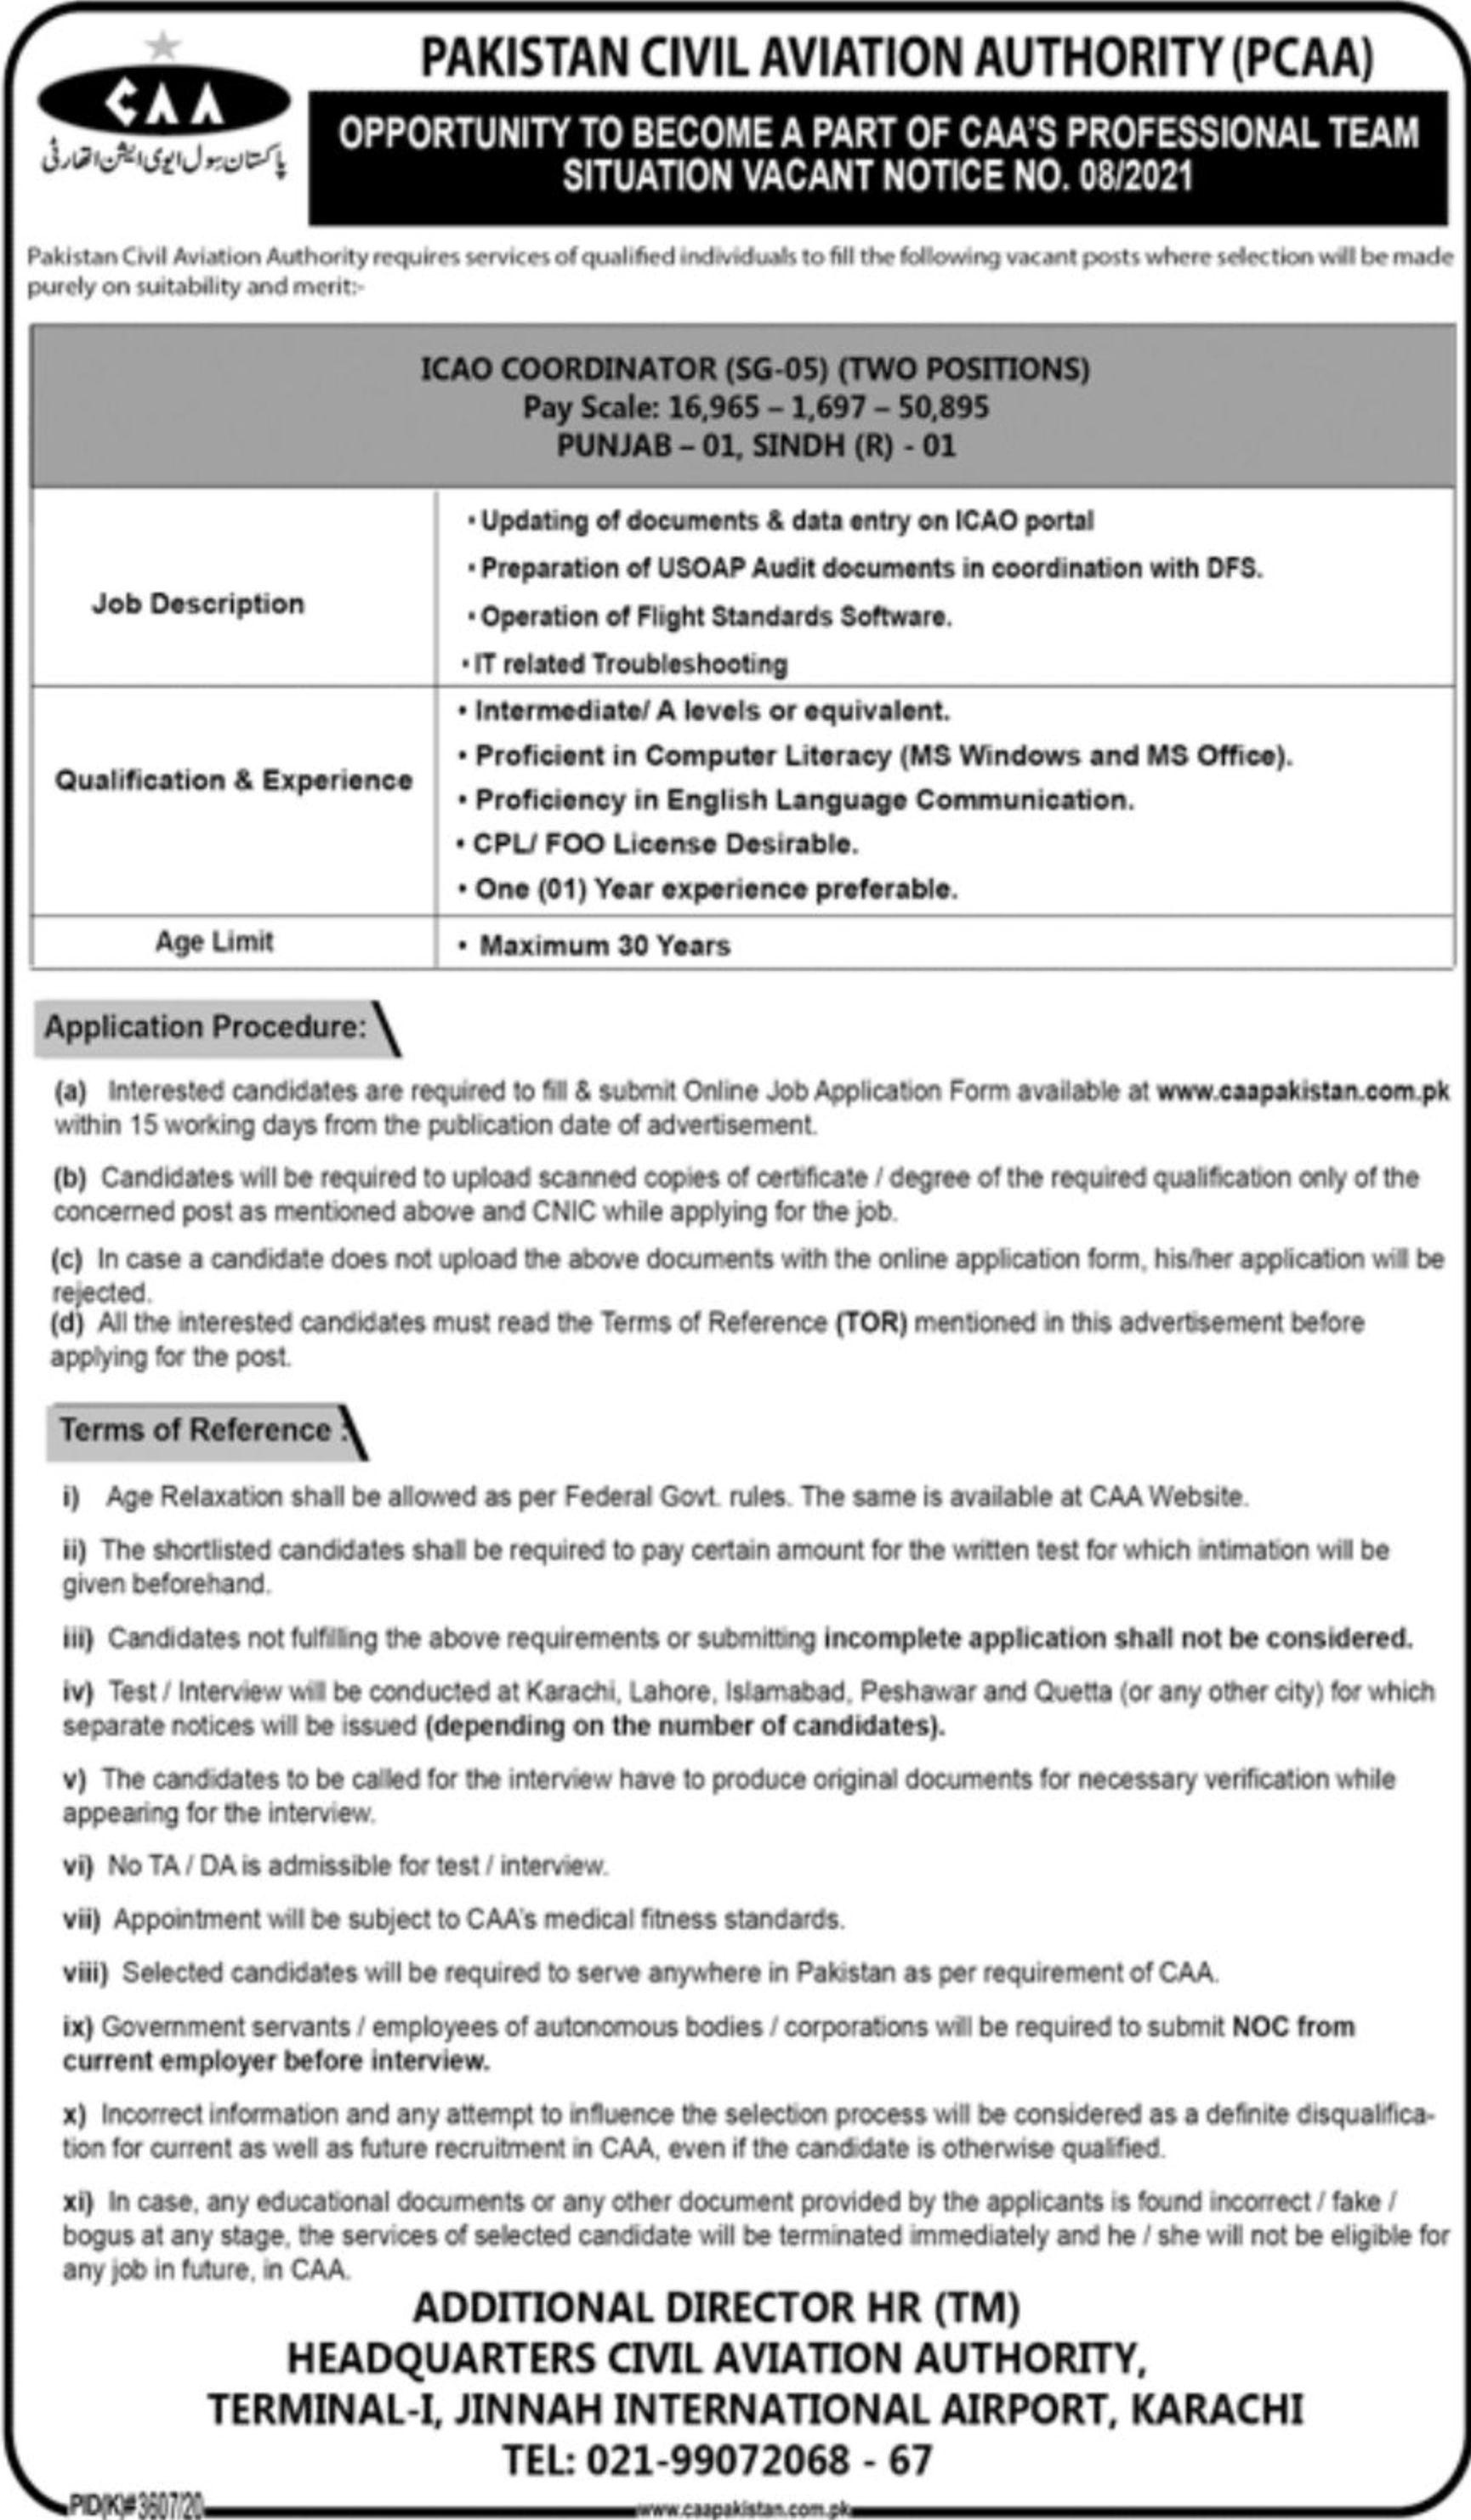 Pakistan Civil Aviation Authority (PCAA) Vacancies 2021 3